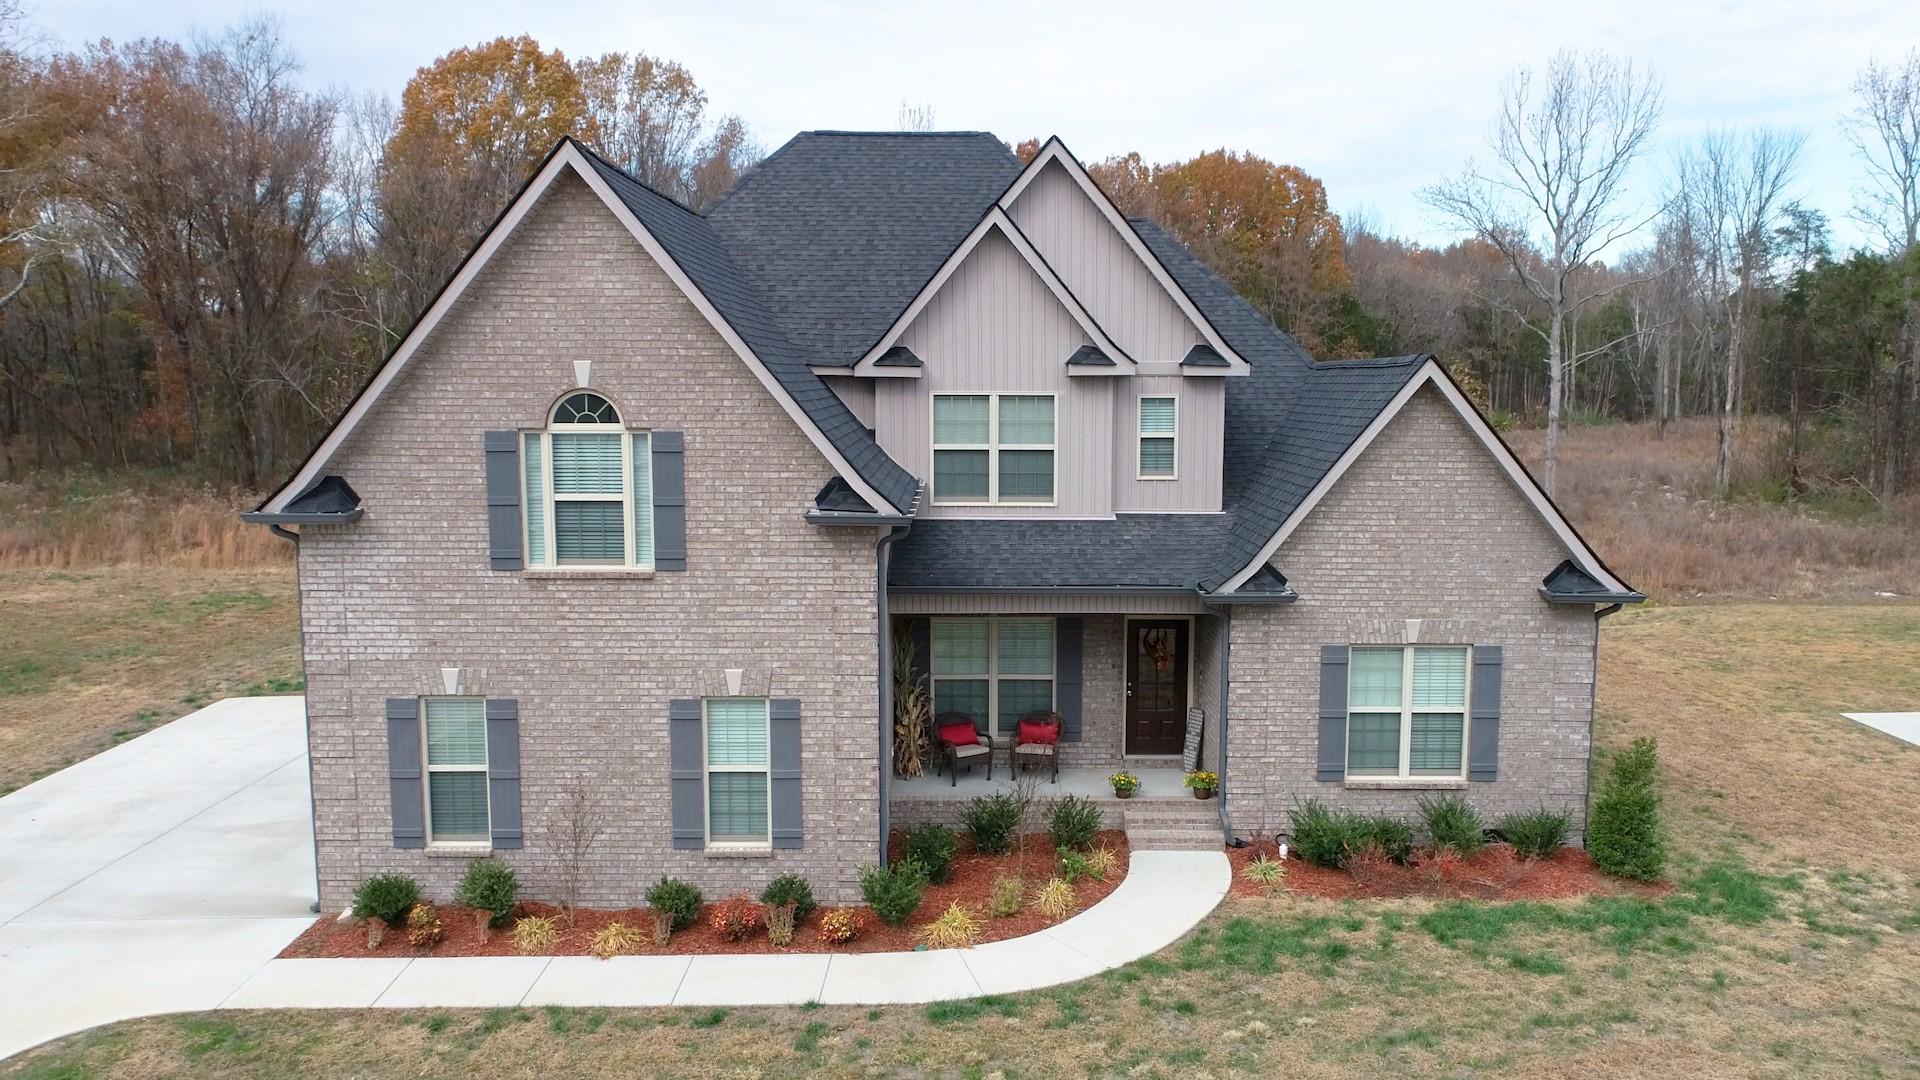 1604 Ansley Kay Dr, Christiana, TN 37037 - Christiana, TN real estate listing